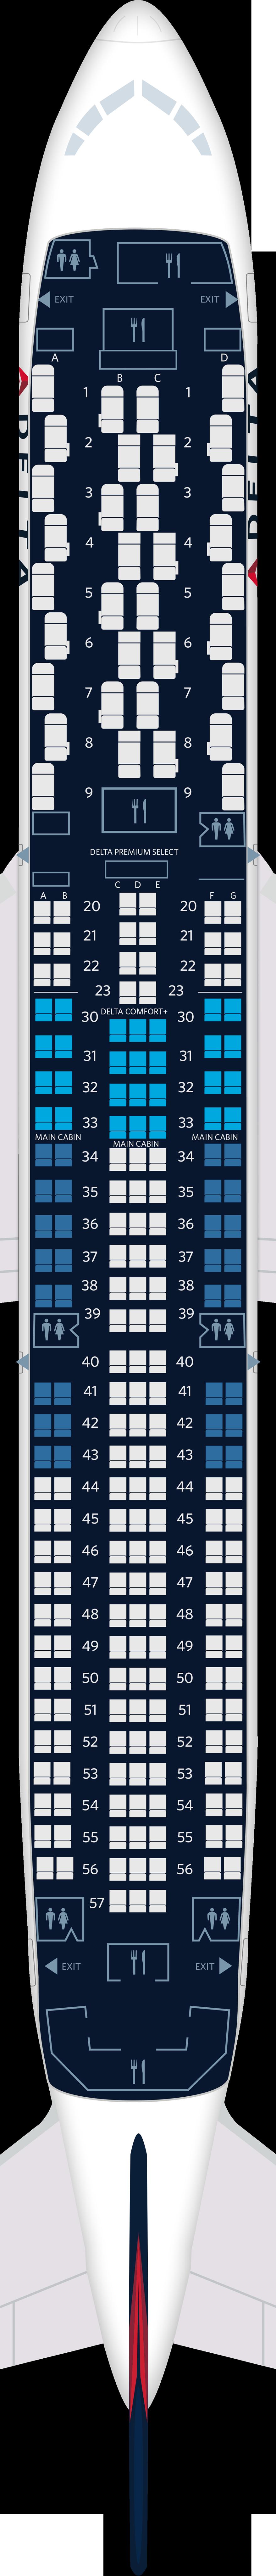 Boeing 767-400ER Aircraft Seat Maps, Specs & Amenities